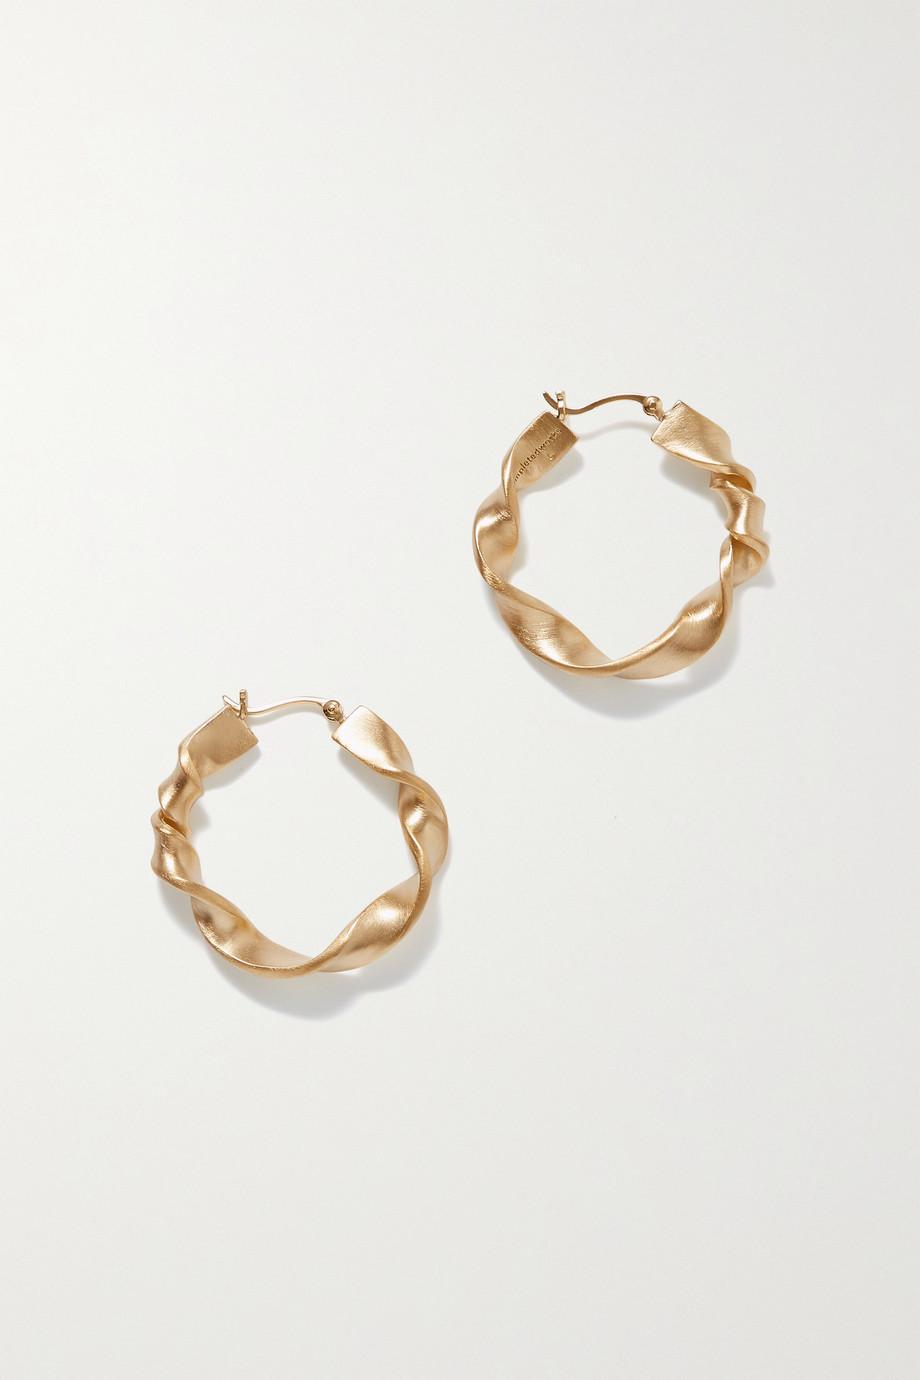 Completedworks Flux gold-plated hoop earrings